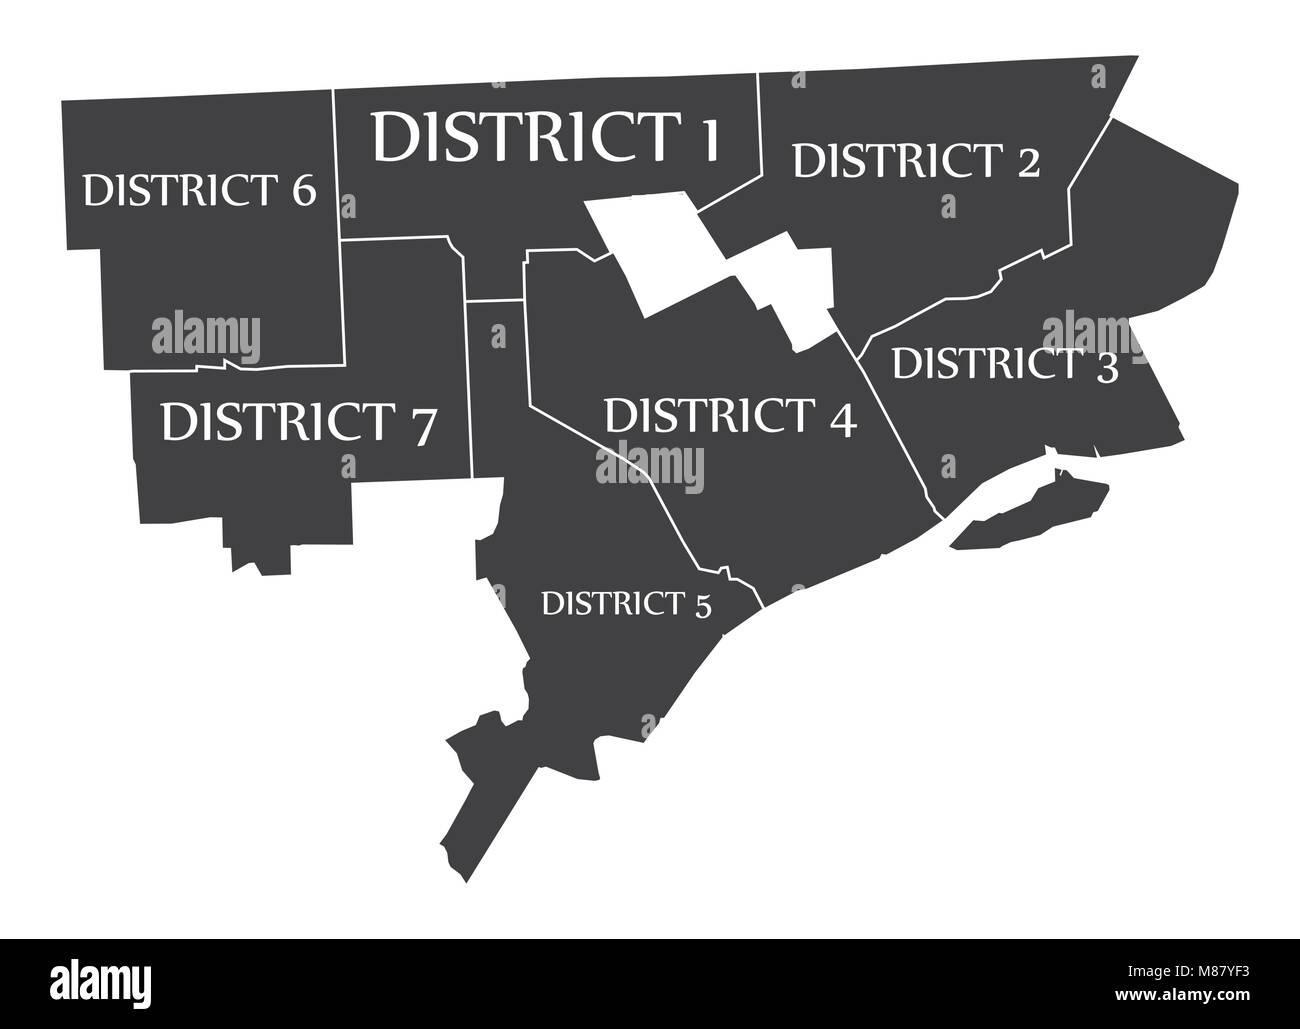 Detroit On Map Of Usa on detroit area, baltimore map usa, detroit on us map, detroit state map, detroit suburbs map, pittsburgh map usa, city street maps usa, michigan usa, detroit on world map, minneapolis map usa, milwaukee map usa, detroit city map,